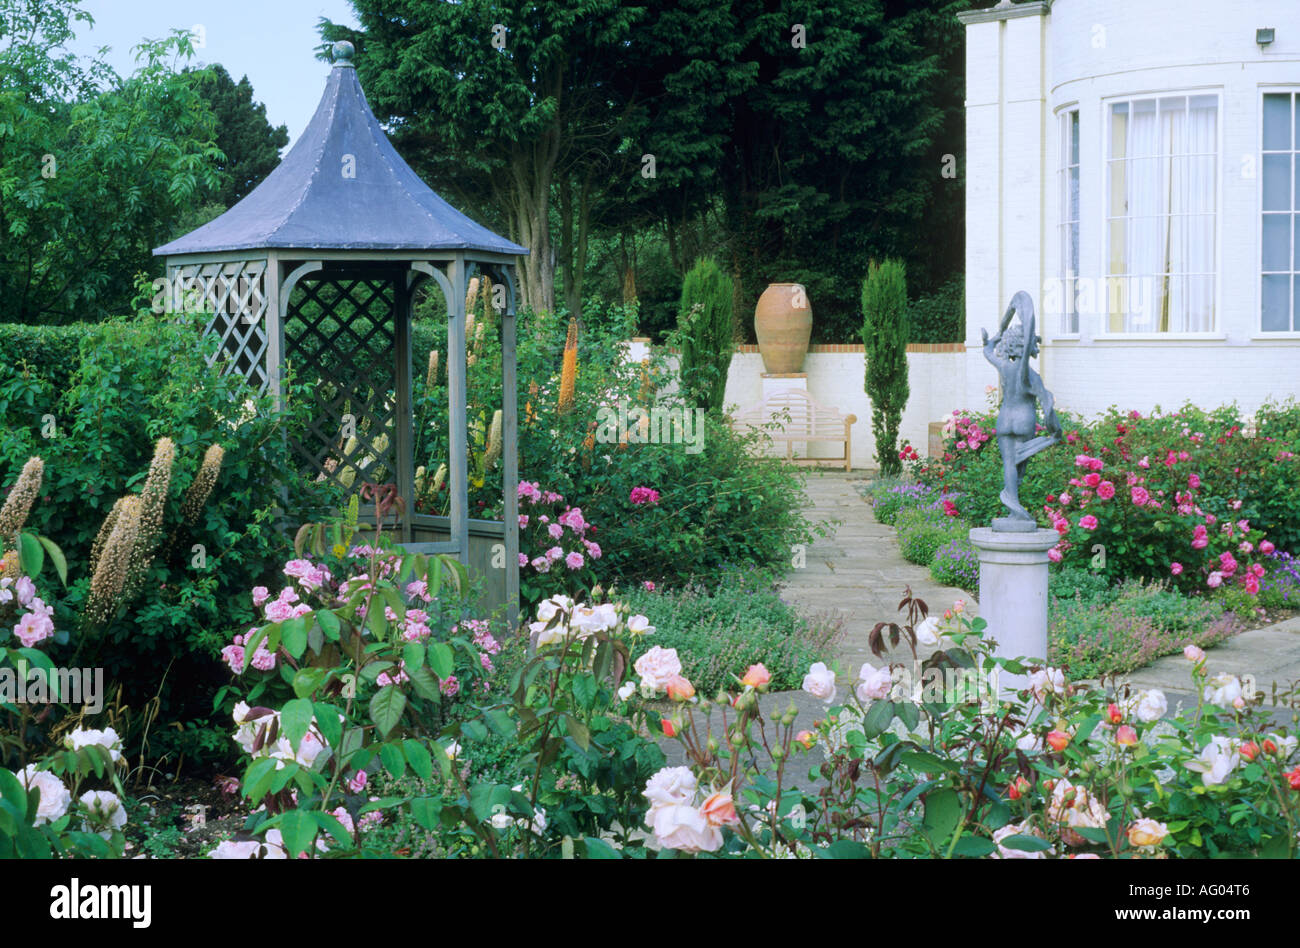 Pagoda, Statue, Urn, Garden Paths, Roses, Kettle Hill, Norfolk, Eremurus,  Sun Shelter